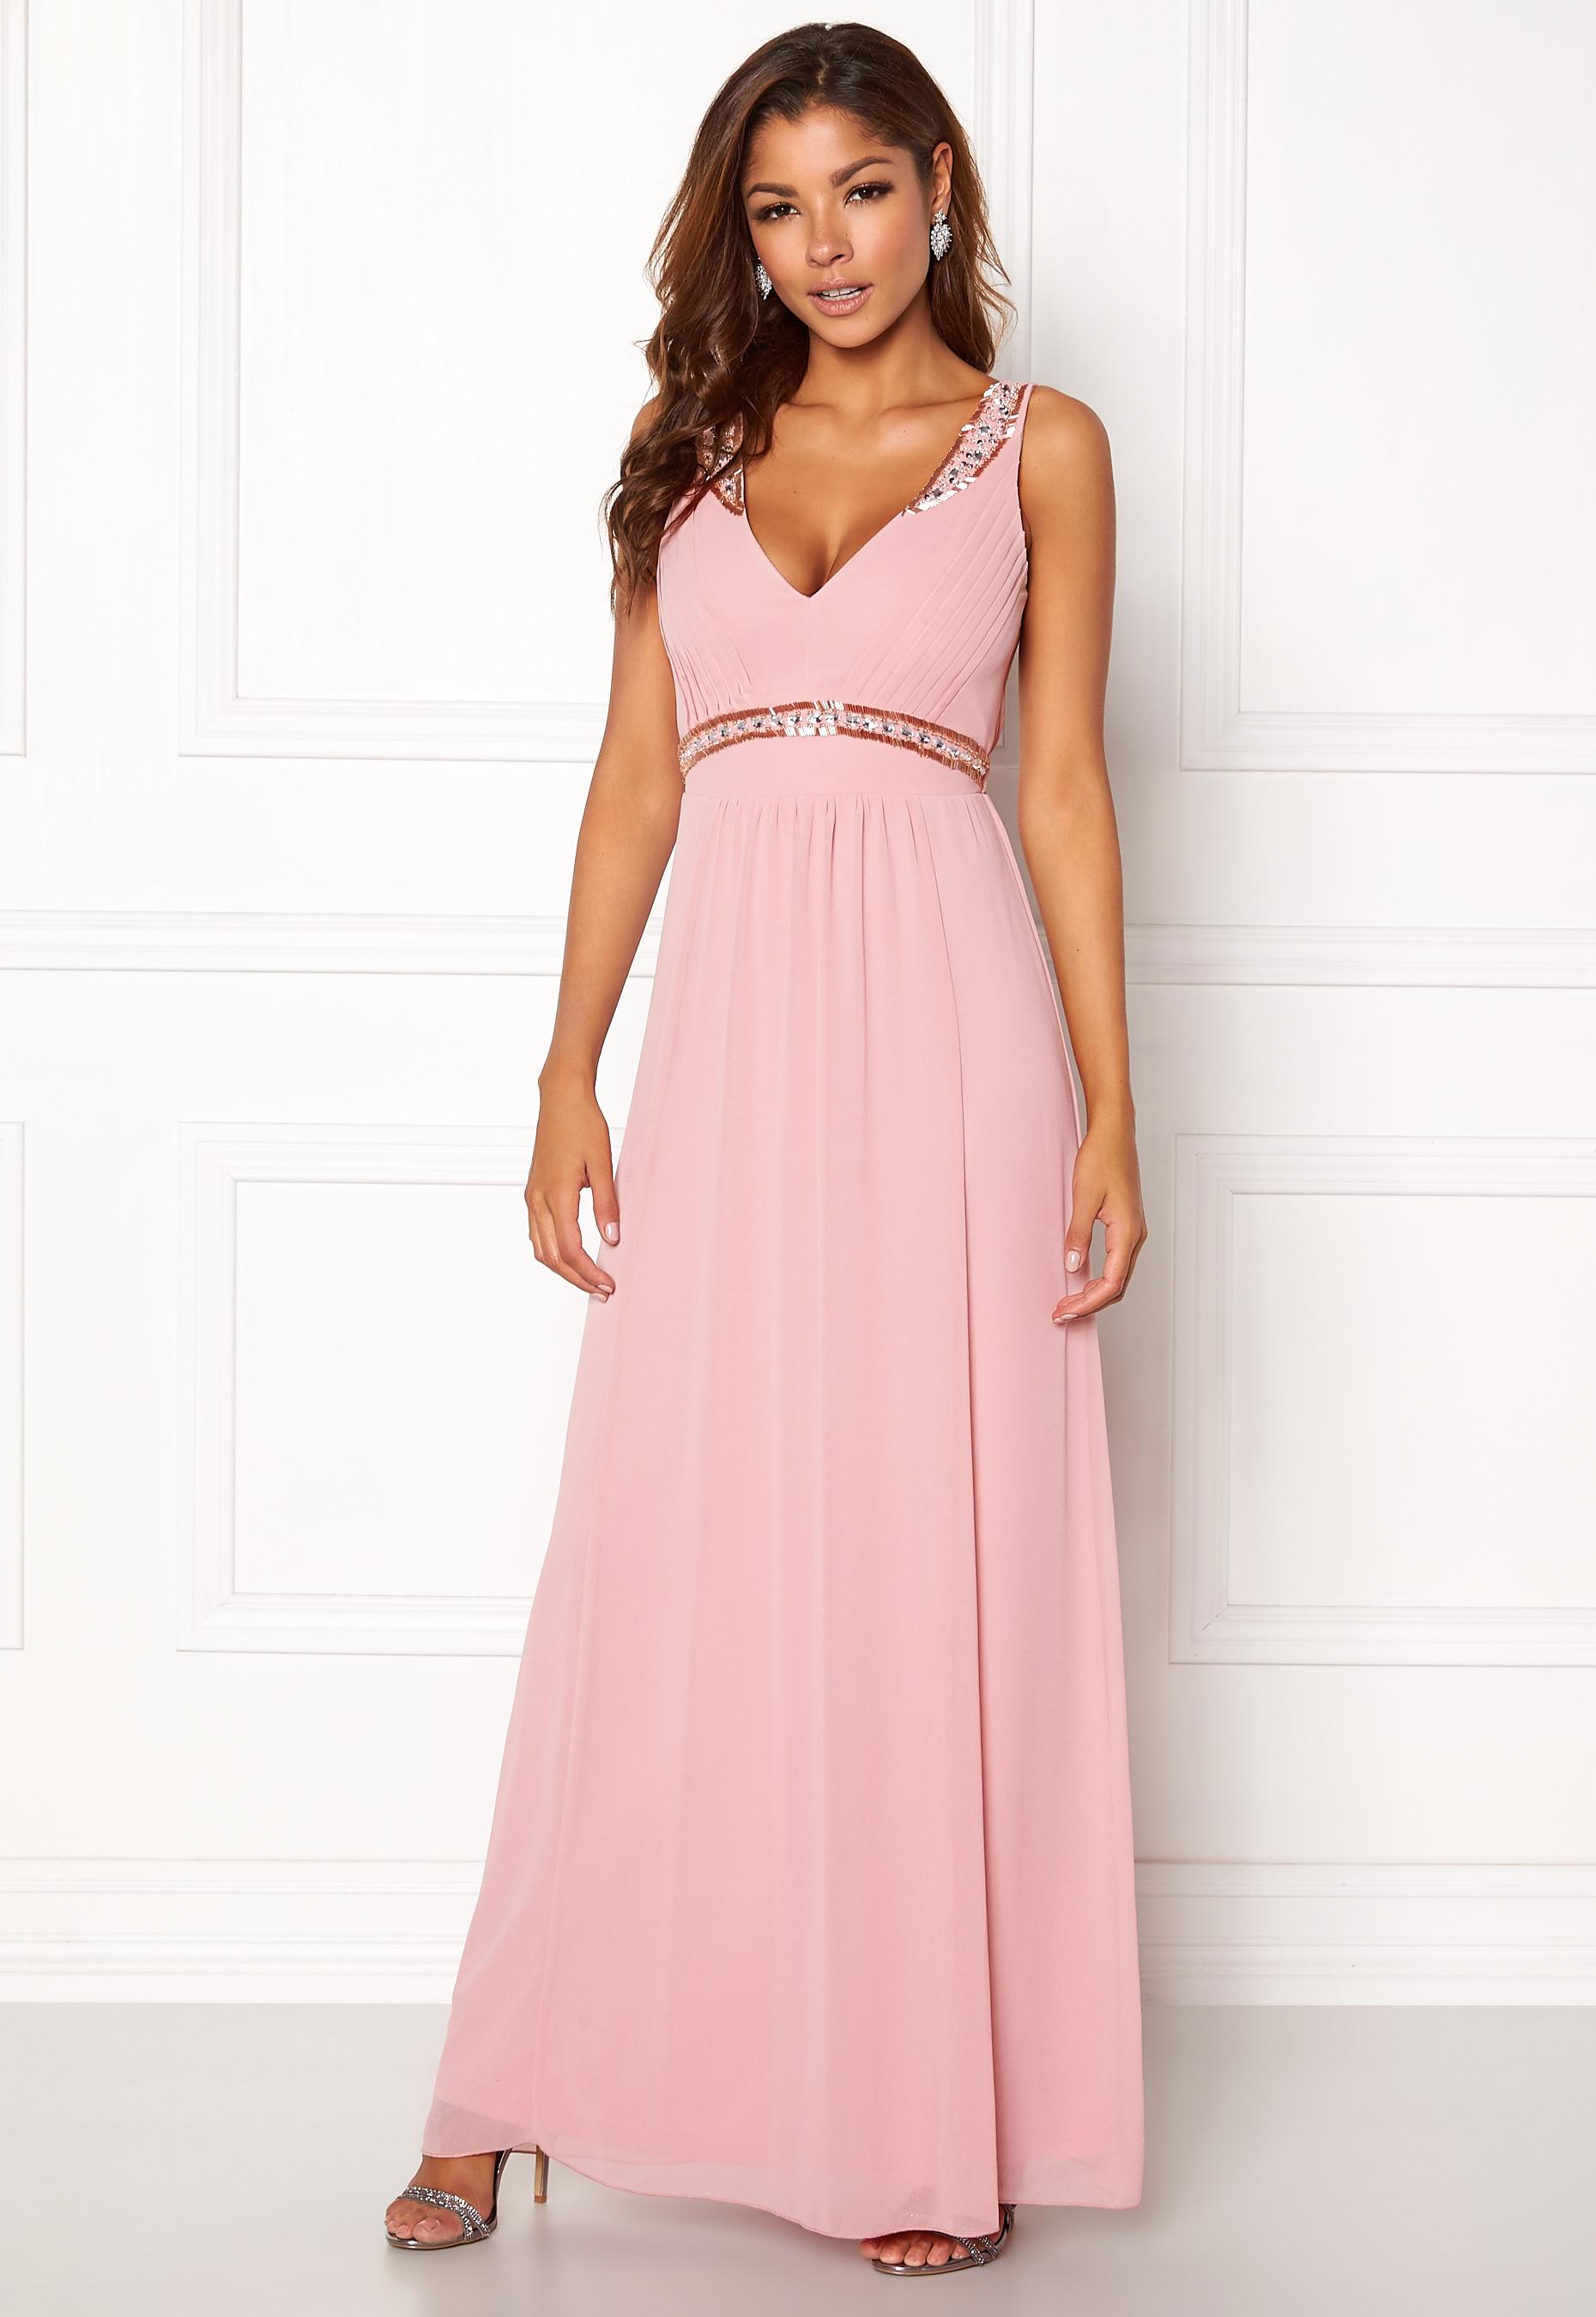 5978c46cef11 Chiara Forthi Tilia Embellished Dress Powder pink - Bubbleroom